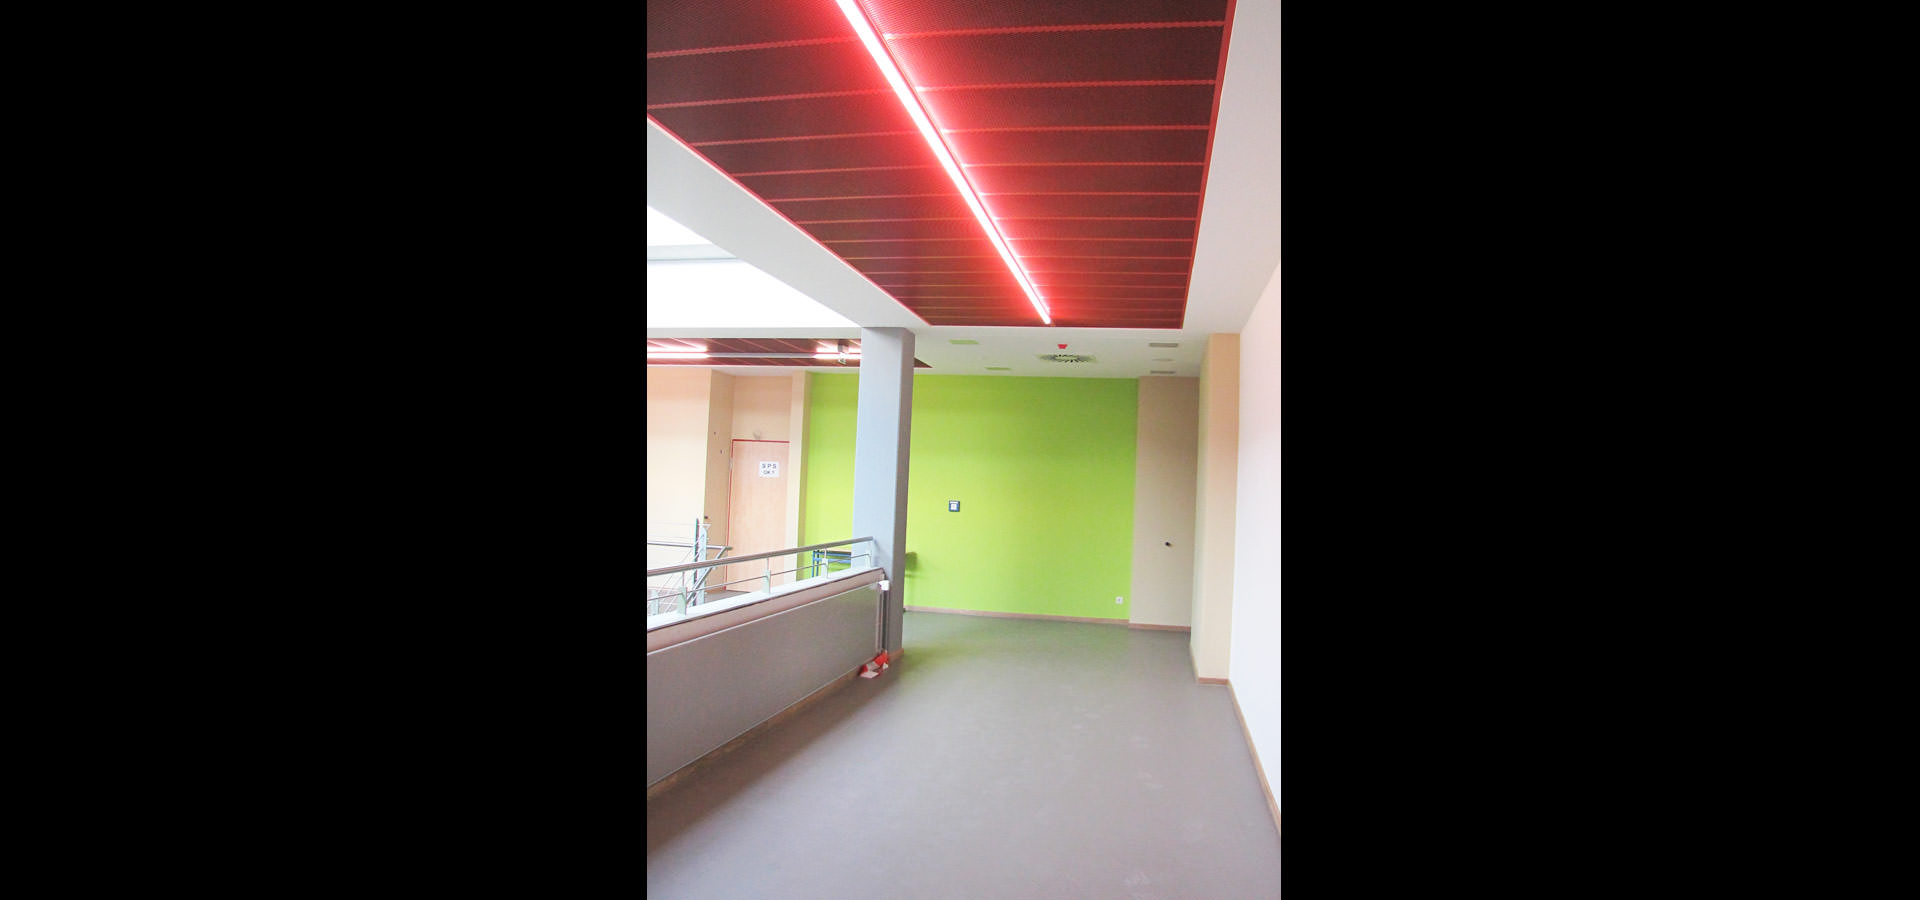 Home U003e LED Beleuchtung U003e Schulbeleuchtung Und Licht Im Kindergarten U003e  Fachakademien Hof